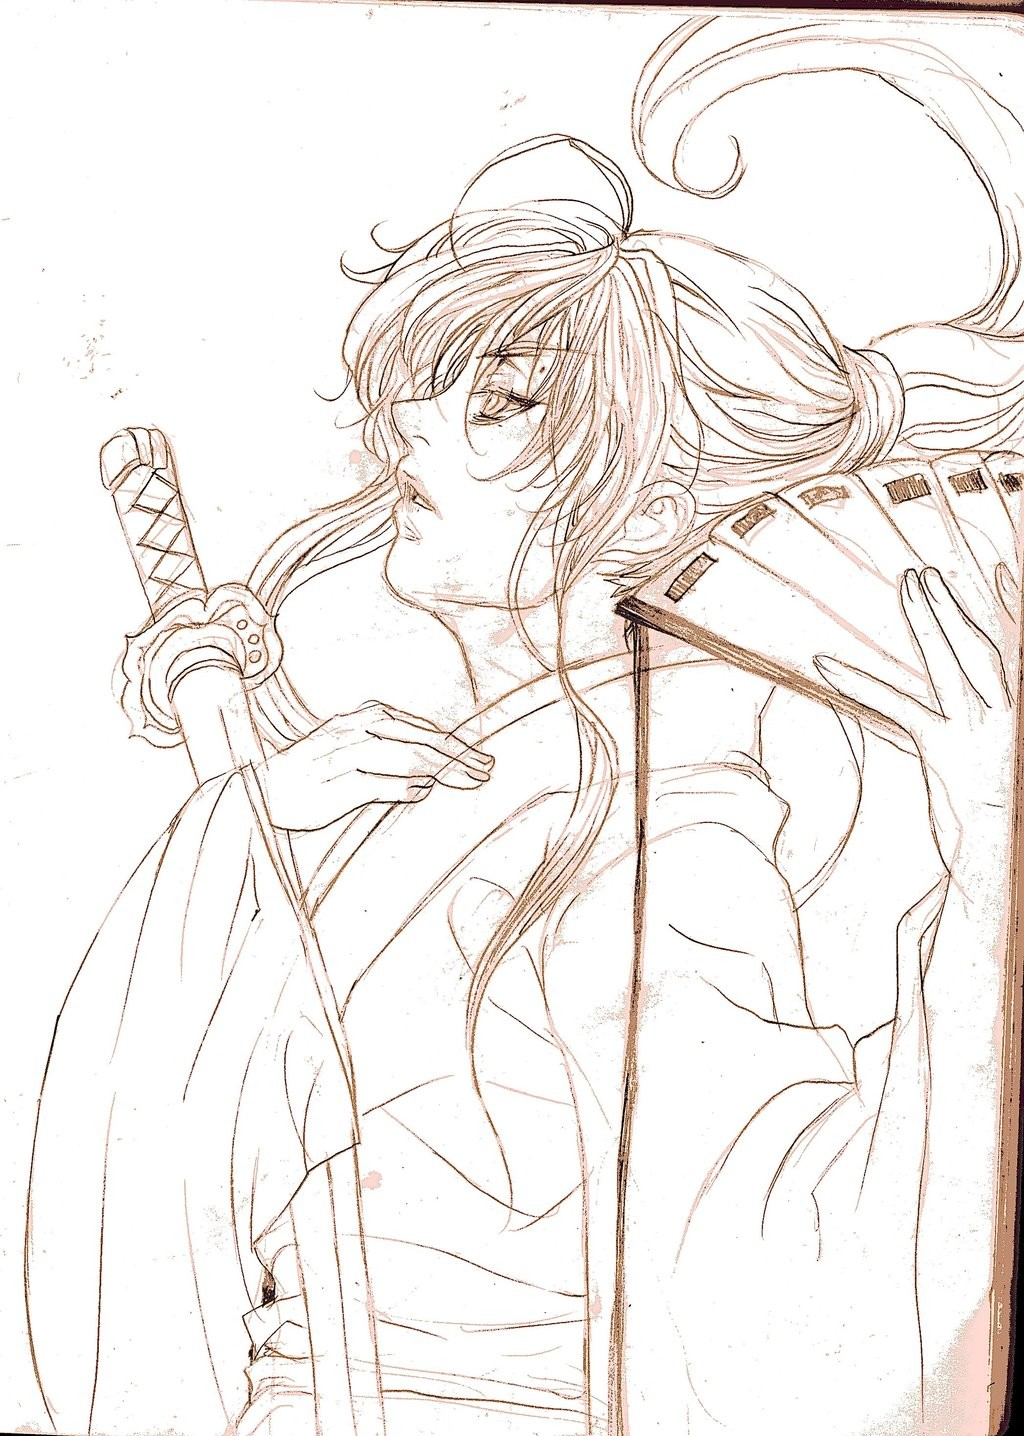 Sasi tanadeerojkul samurai by meisan dbevic5